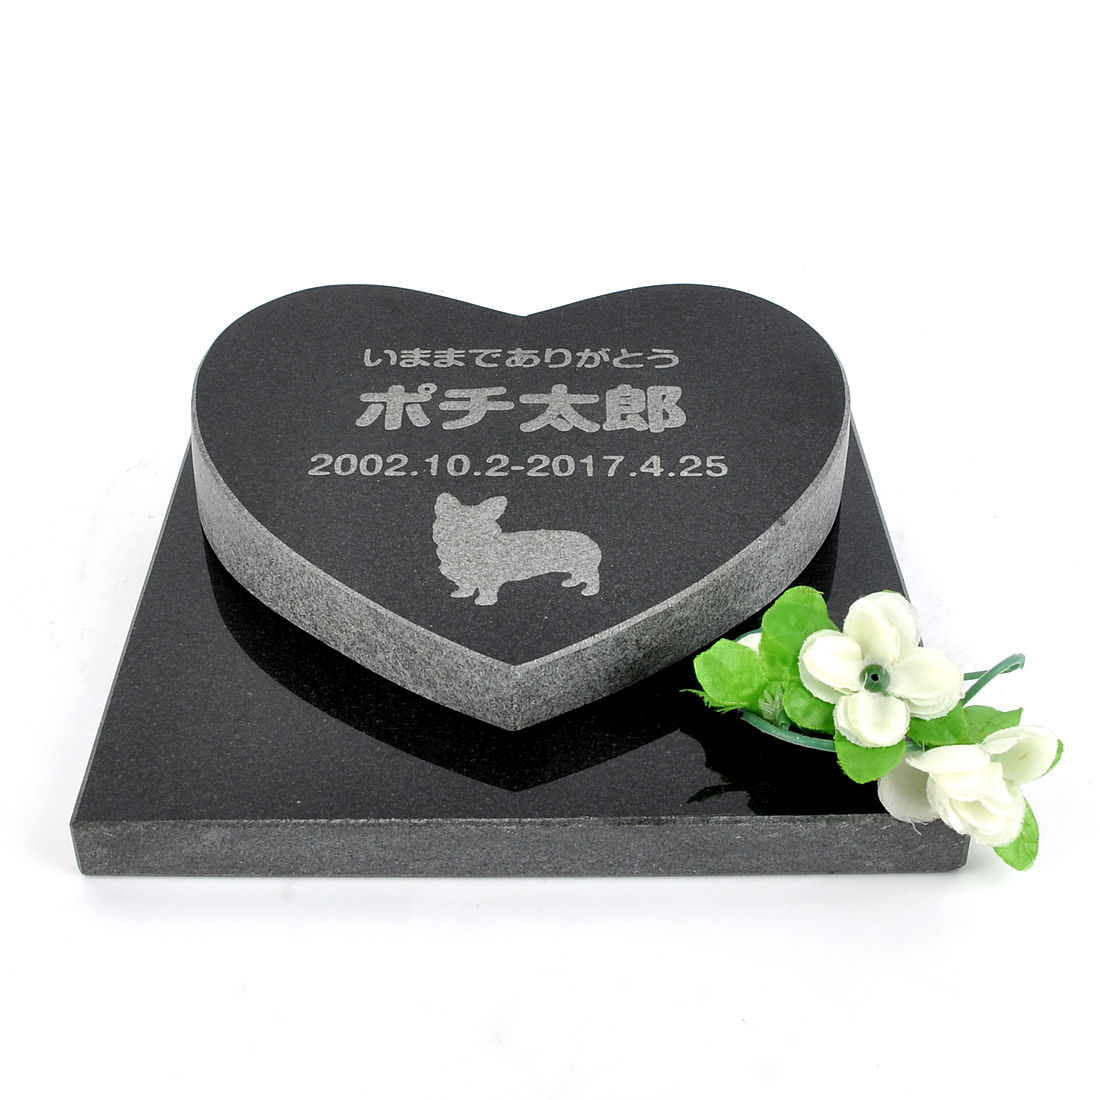 Pet&Love. ペットのお墓 天然石製 セット型 御影石 ブラック ハート プレーン  【HLS_DU】【楽ギフ_名入れ】 attr131attr ctgr2ctgr sml3sml+ctgr2ctgr DOG